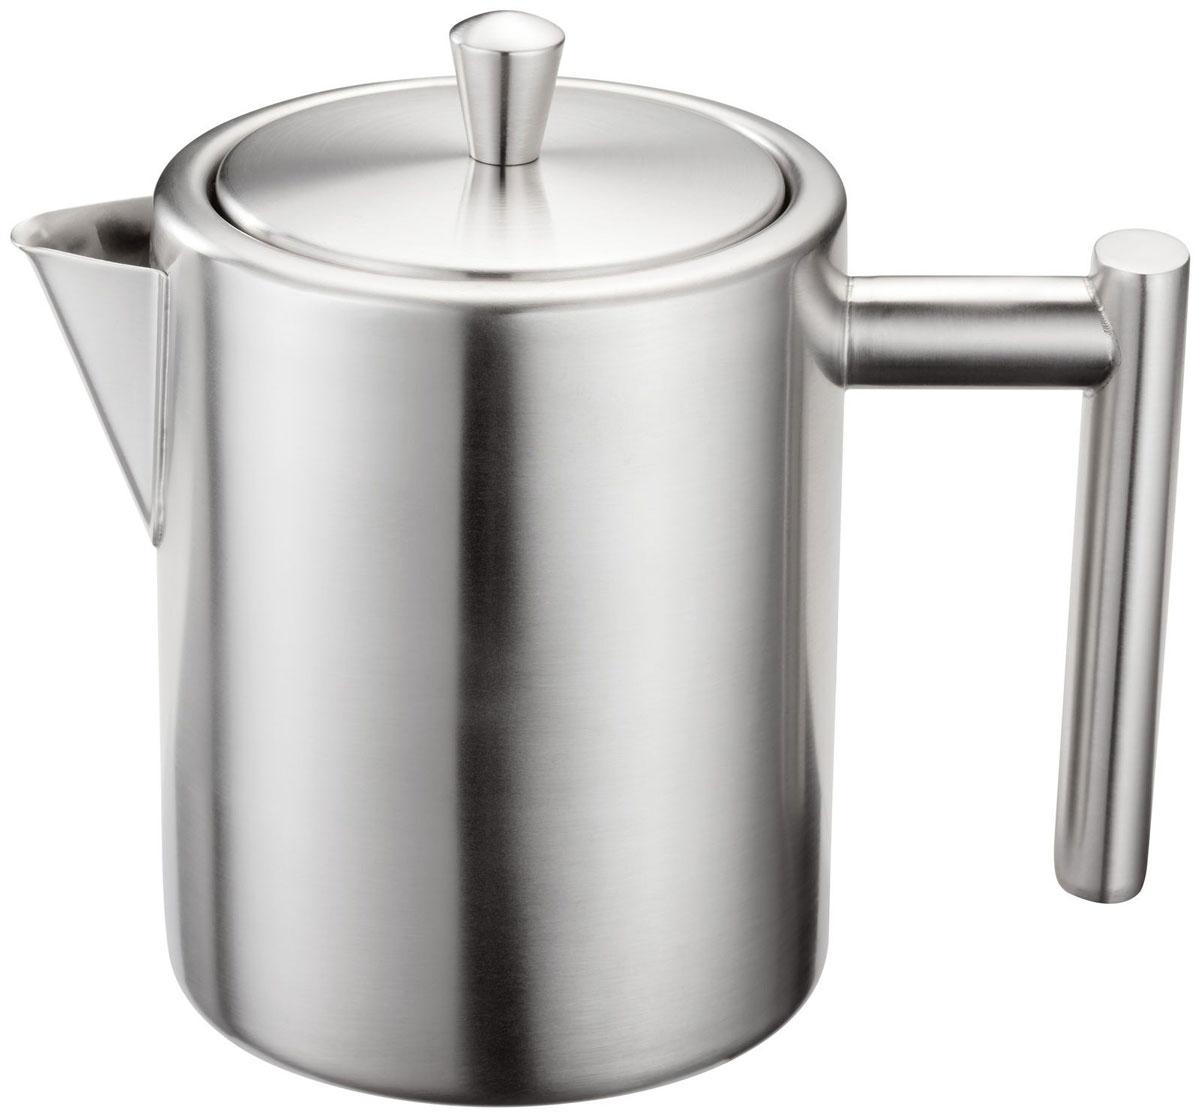 Чайник заварочный Silampos Oslo, цвет: матовая сталь, 600 мл. 41281318SM90 посуда кухонная